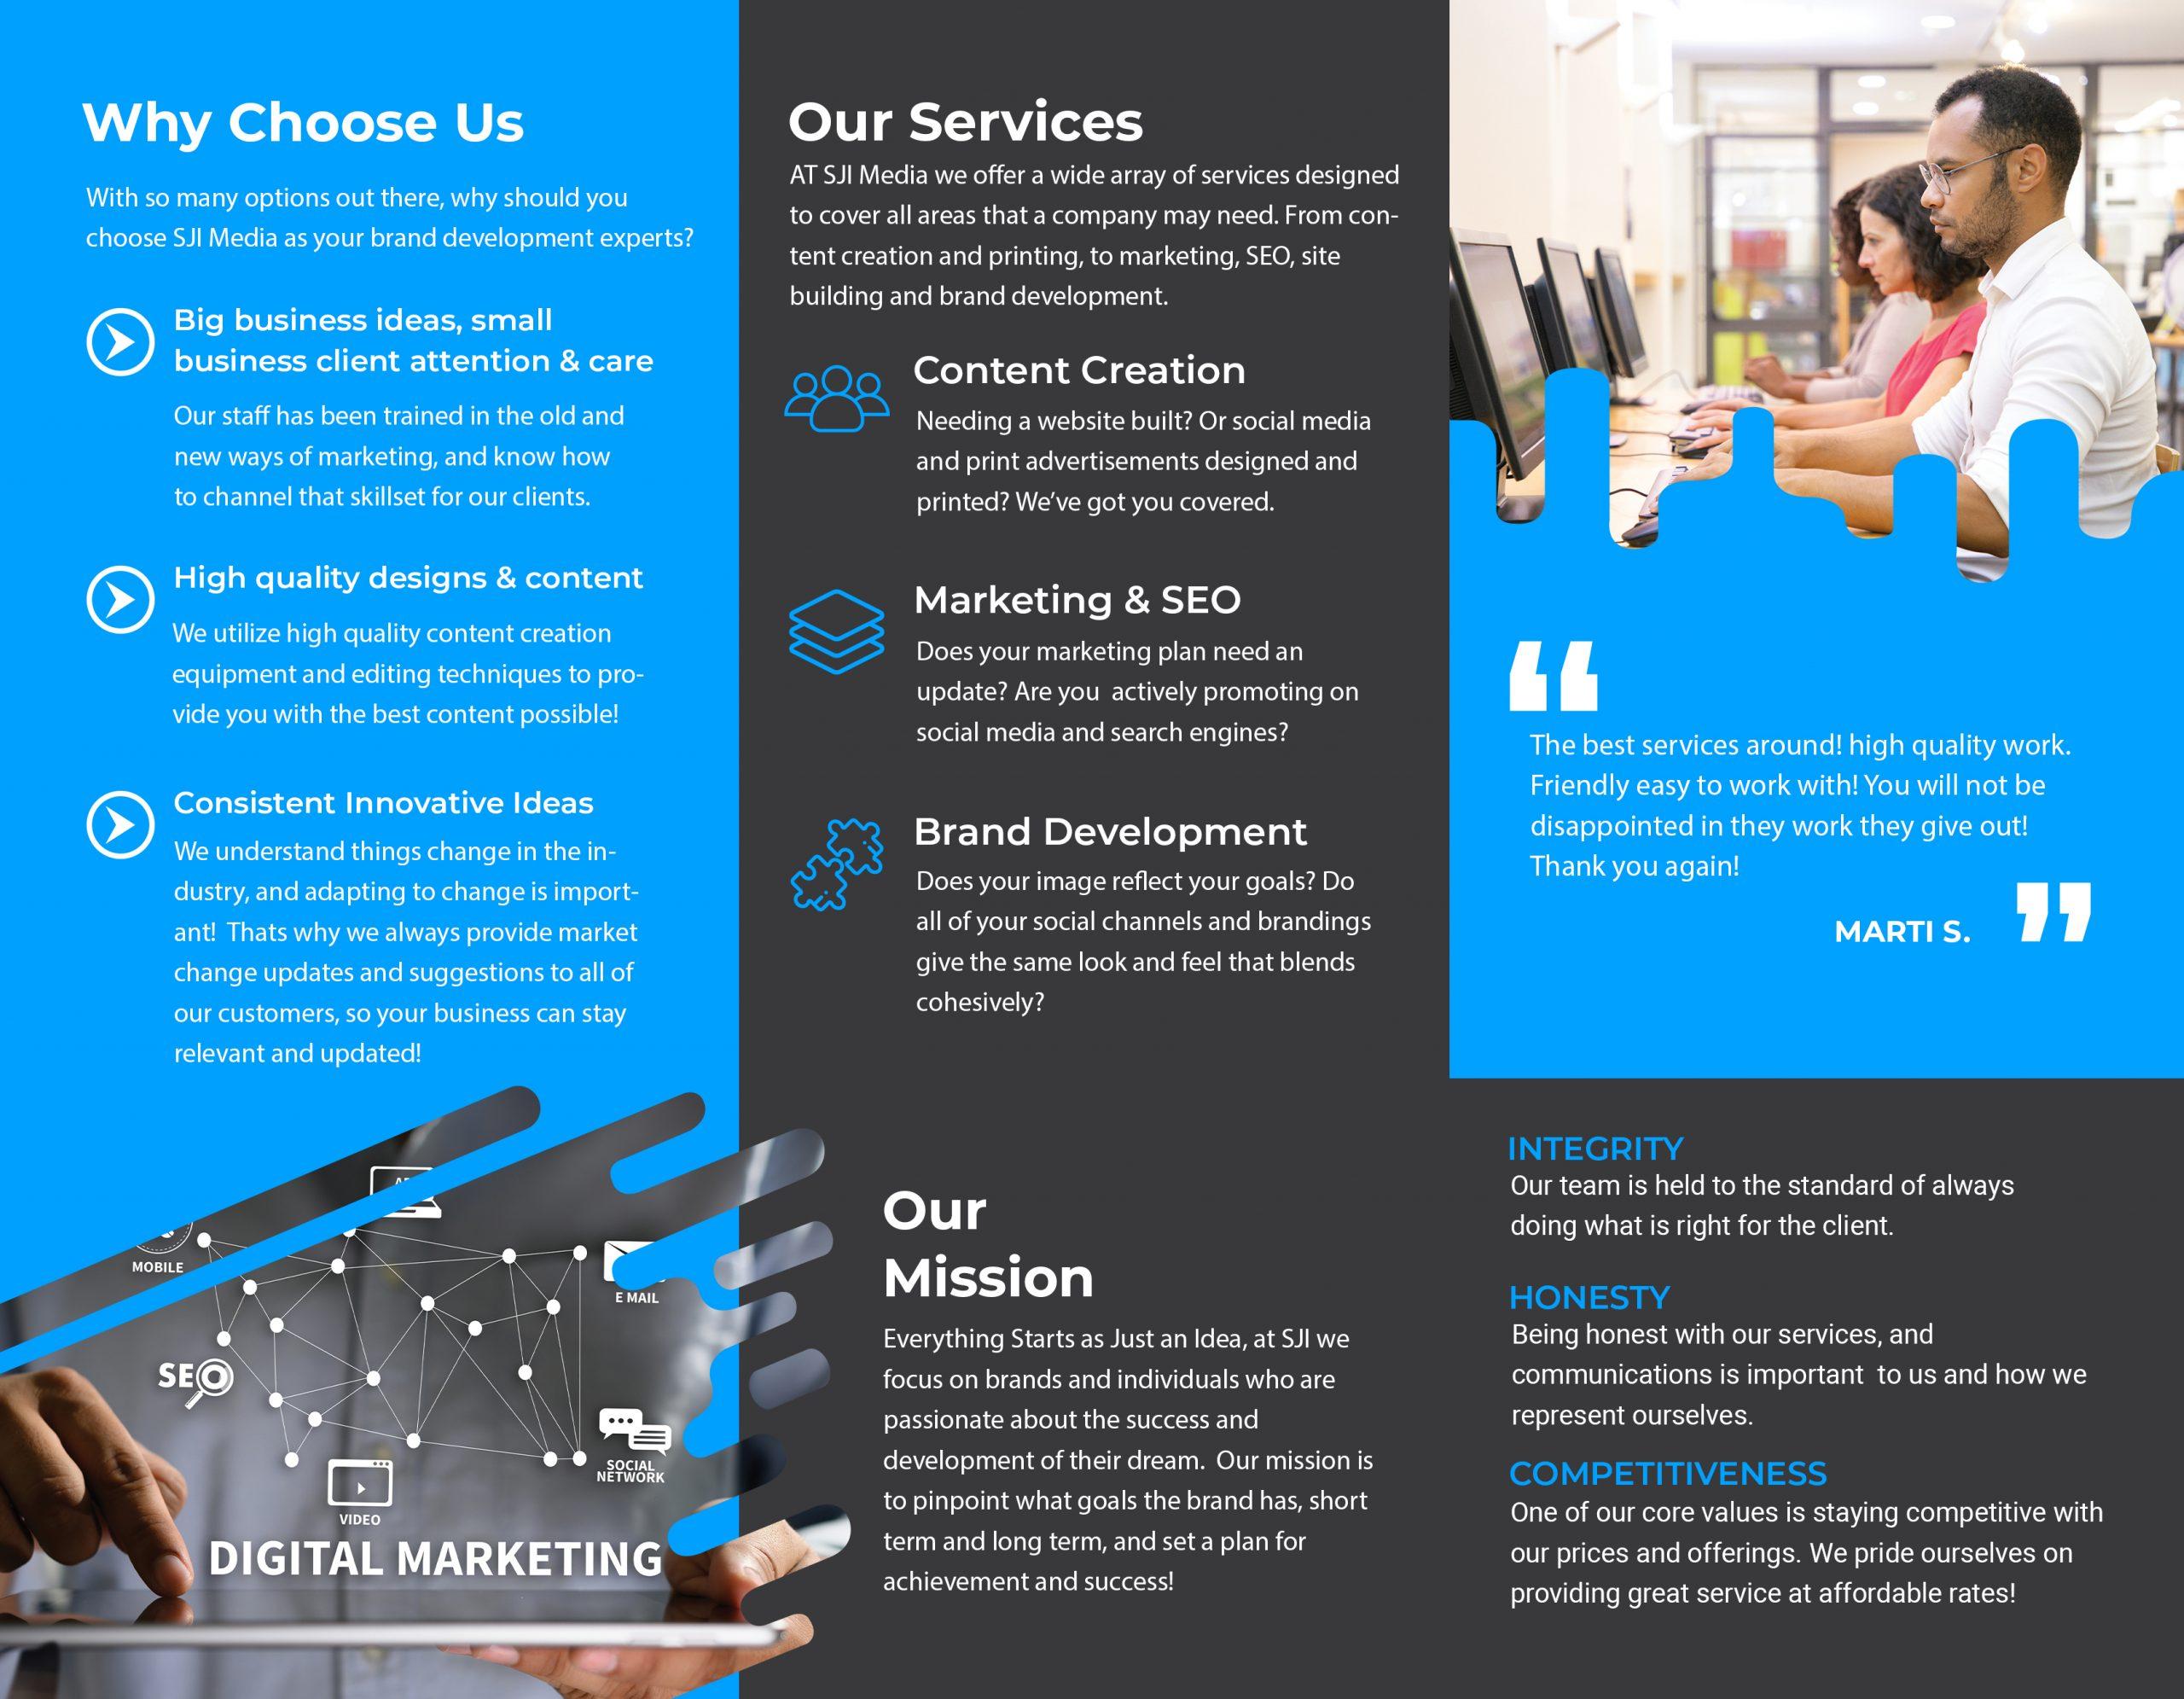 SJI Media 2020 BrochureINSIDE